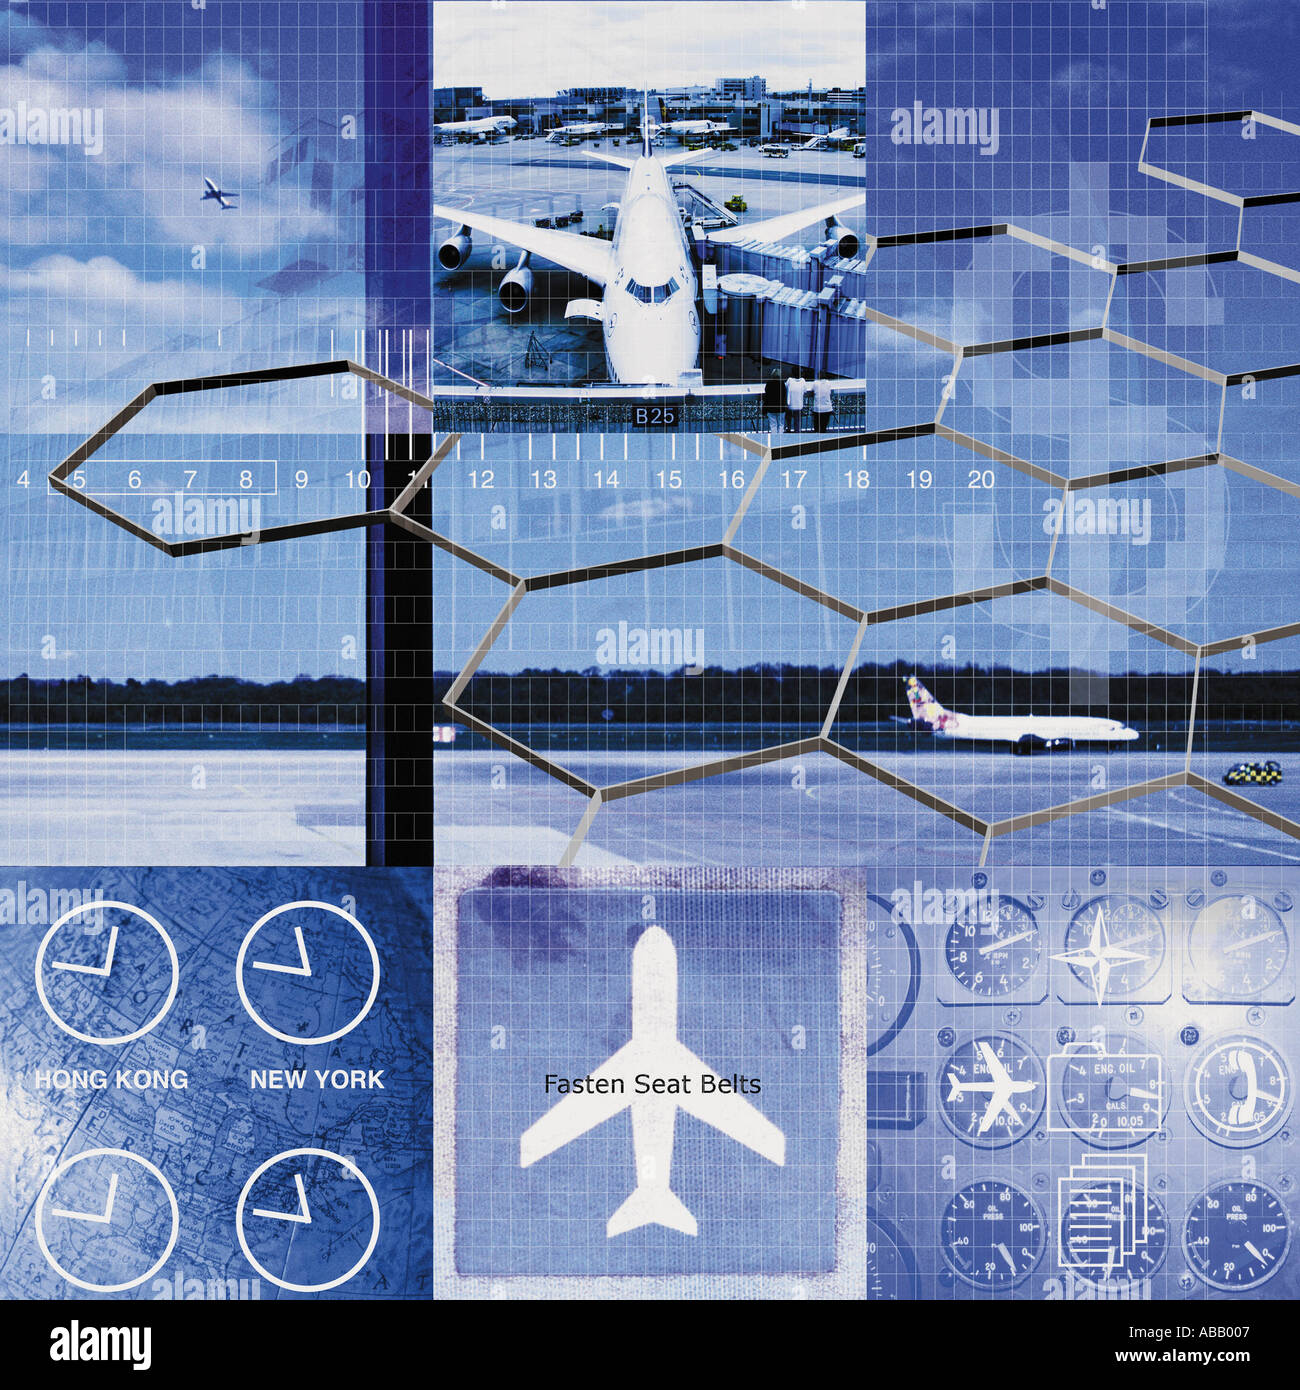 International air travel - Stock Image